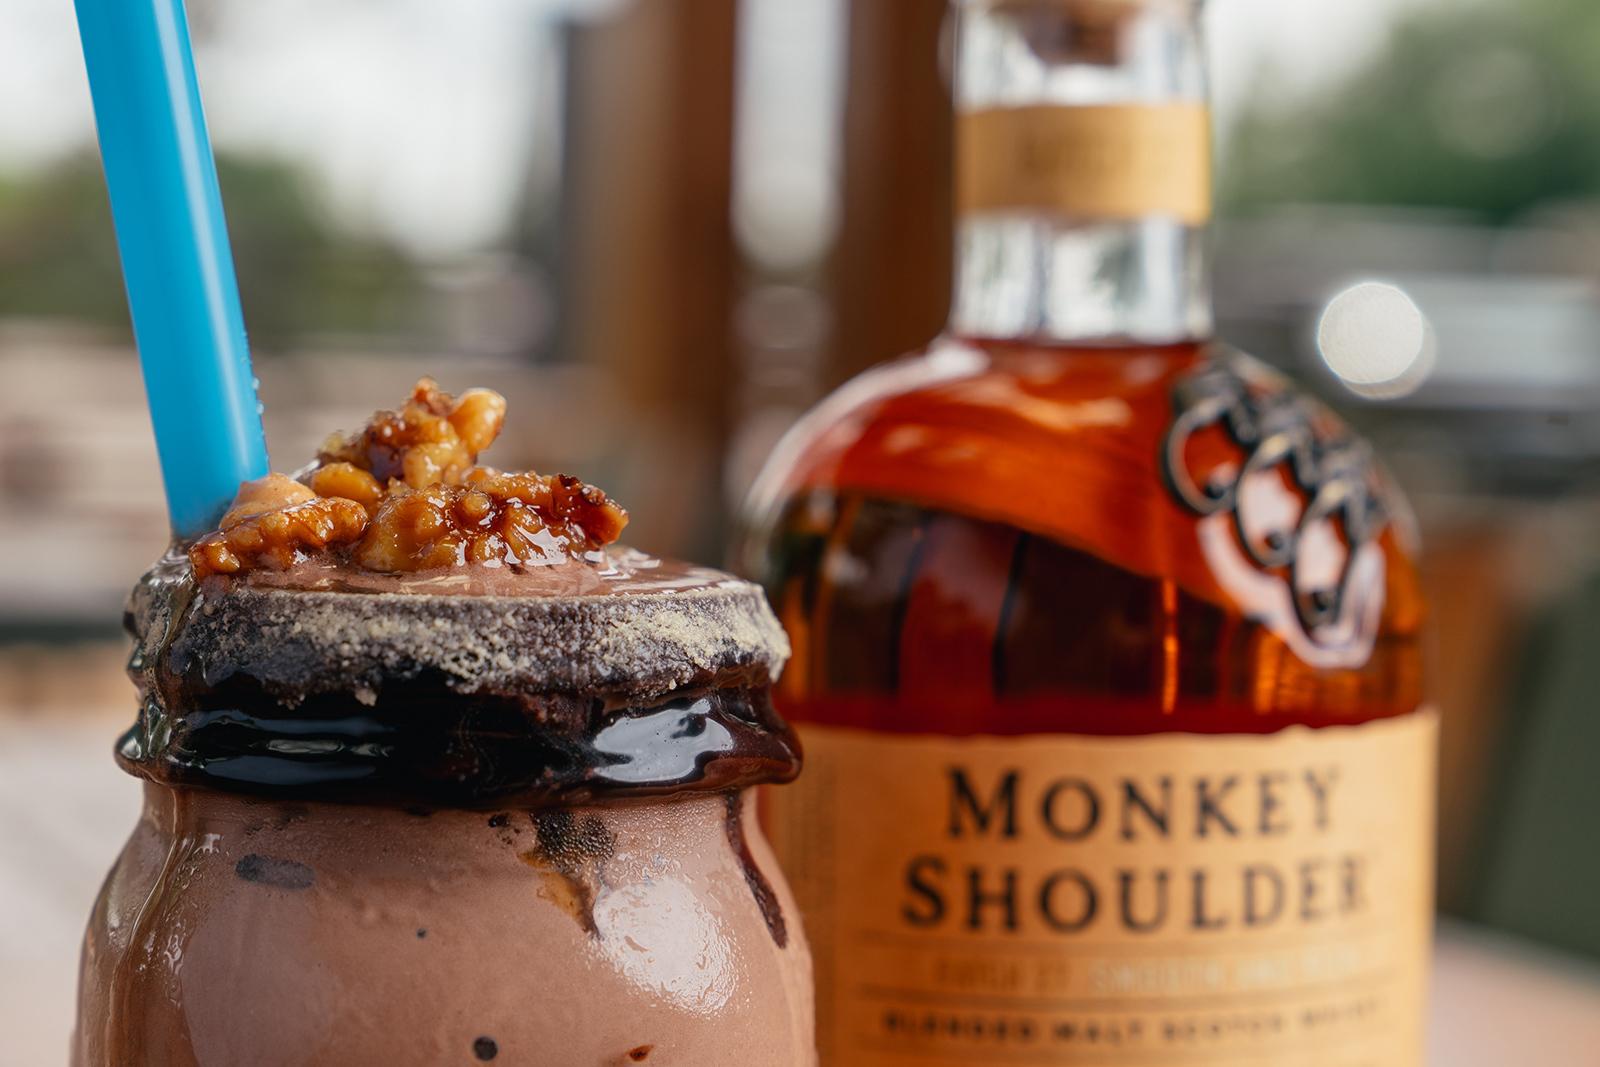 Cow Tipping Creamery Ice Cream + Monkey Shoulder Scotch Boozy Dessert Drinks photo